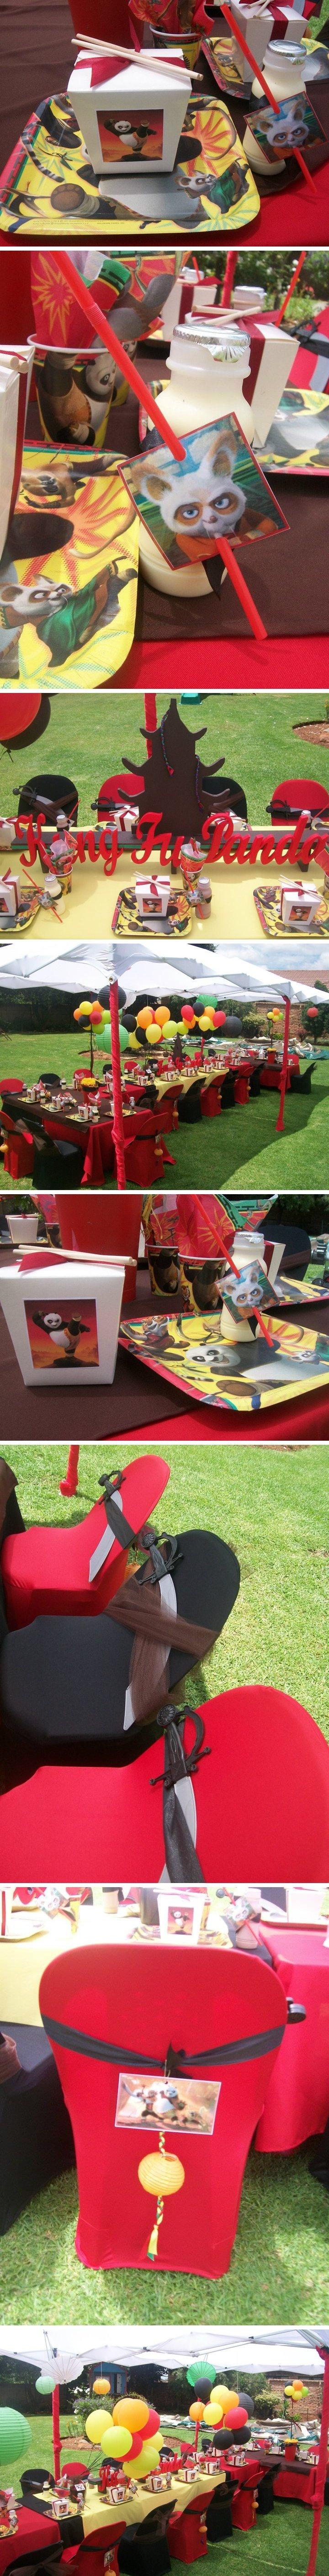 Kung Fu Panda Party By: Supakids Alberton